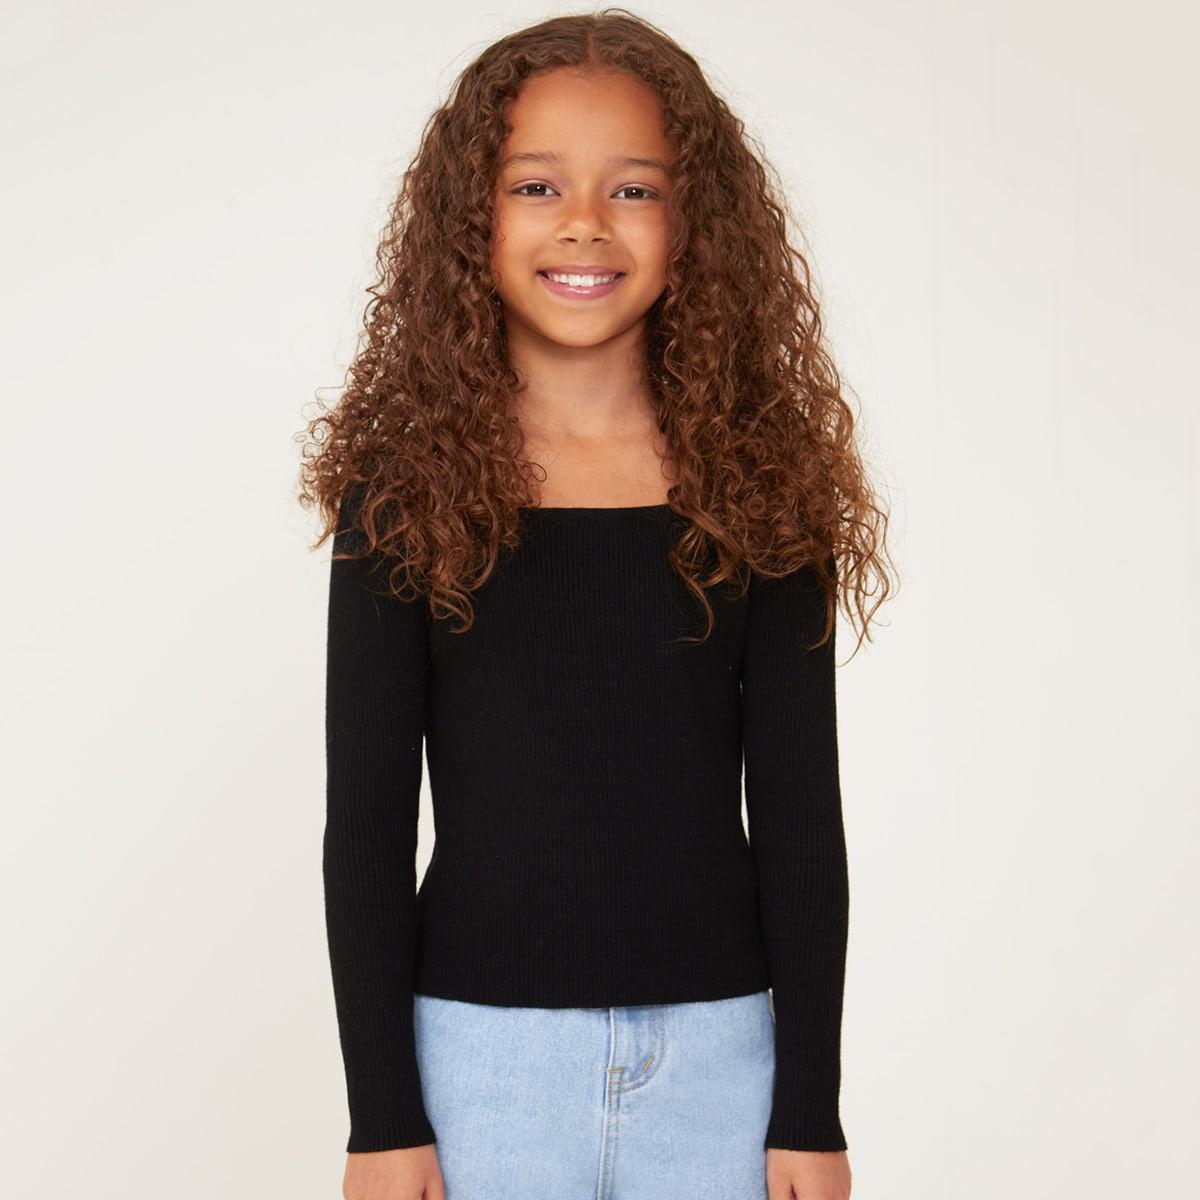 Girls Solid Rib Knit Sweater